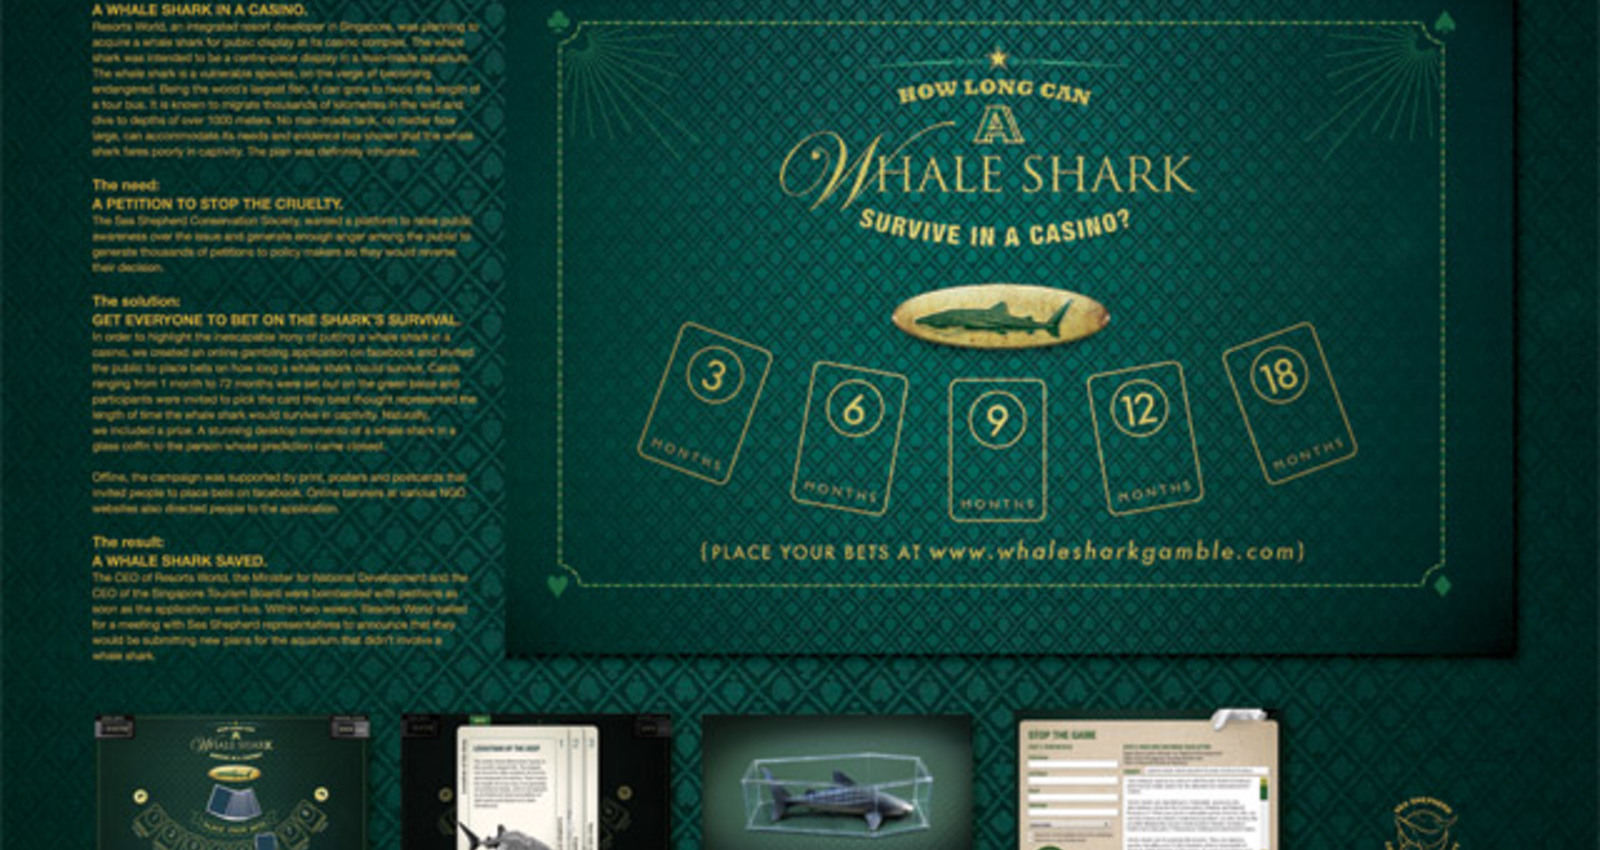 Whale Shark Gamble